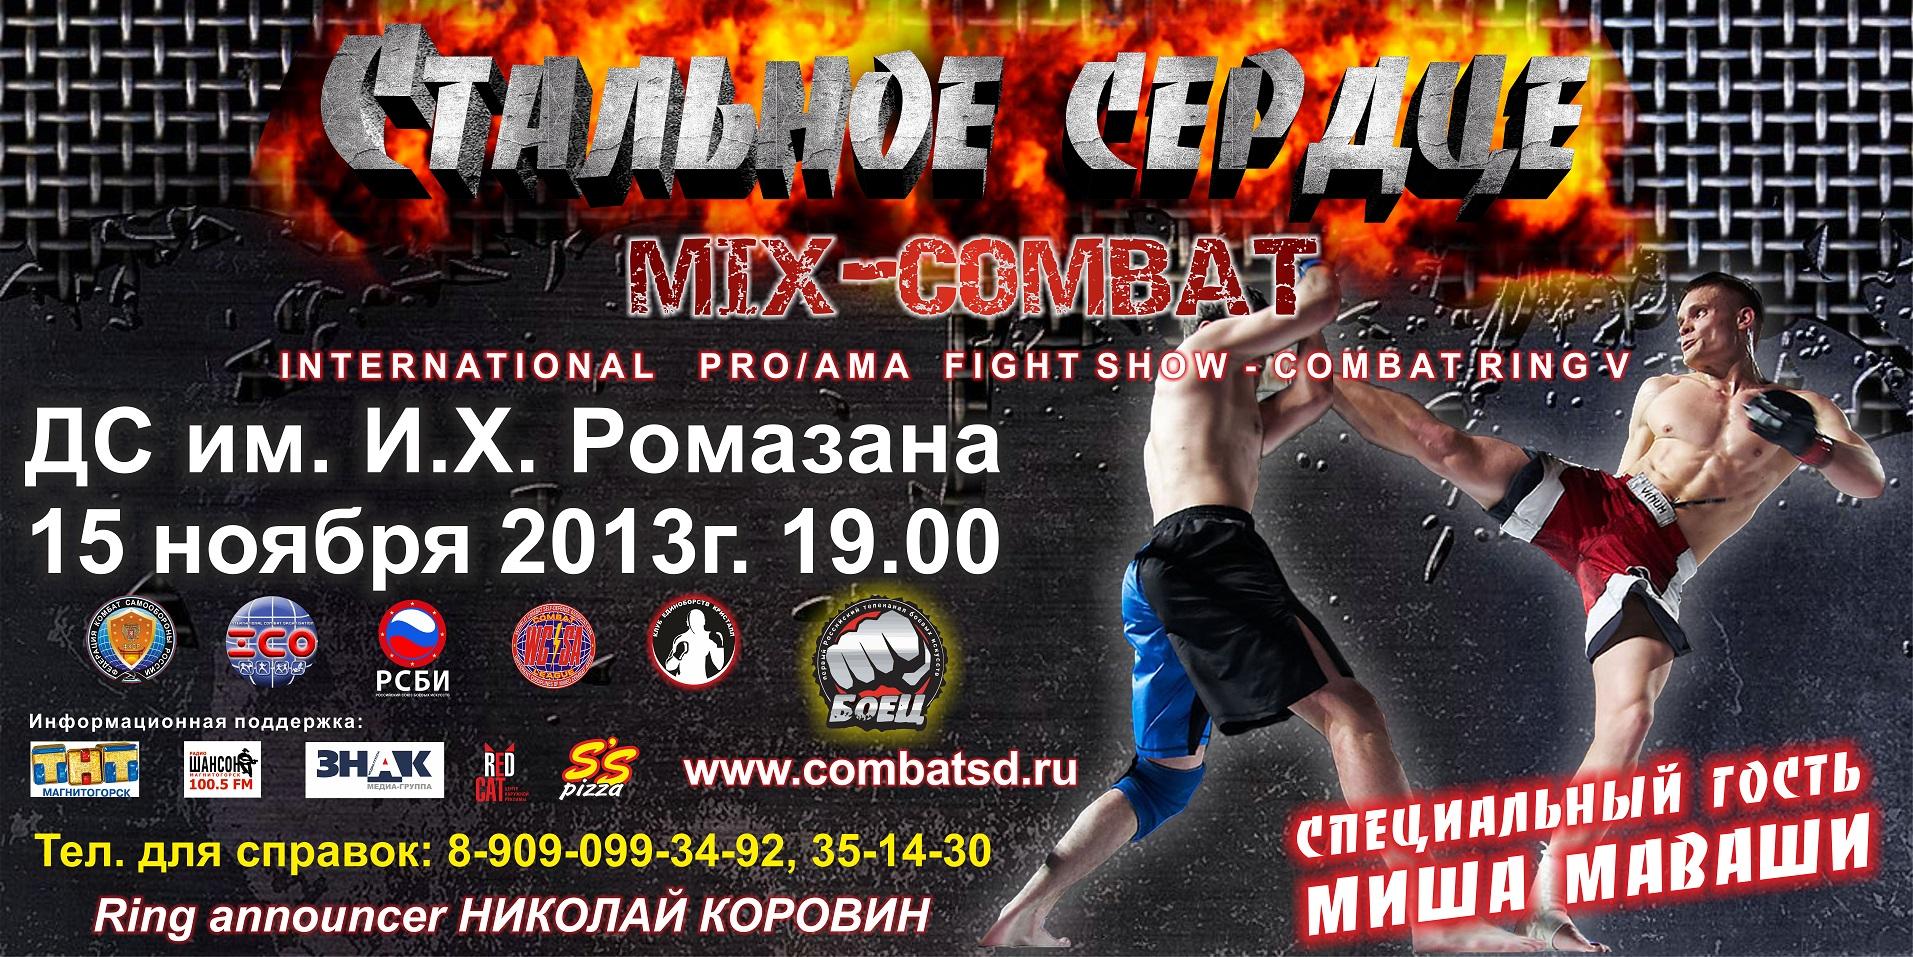 http://www.combatsd.ru/images/upload/Стальное%20сердце%2015%20ноября%20реклама%20на%20сайт.jpg